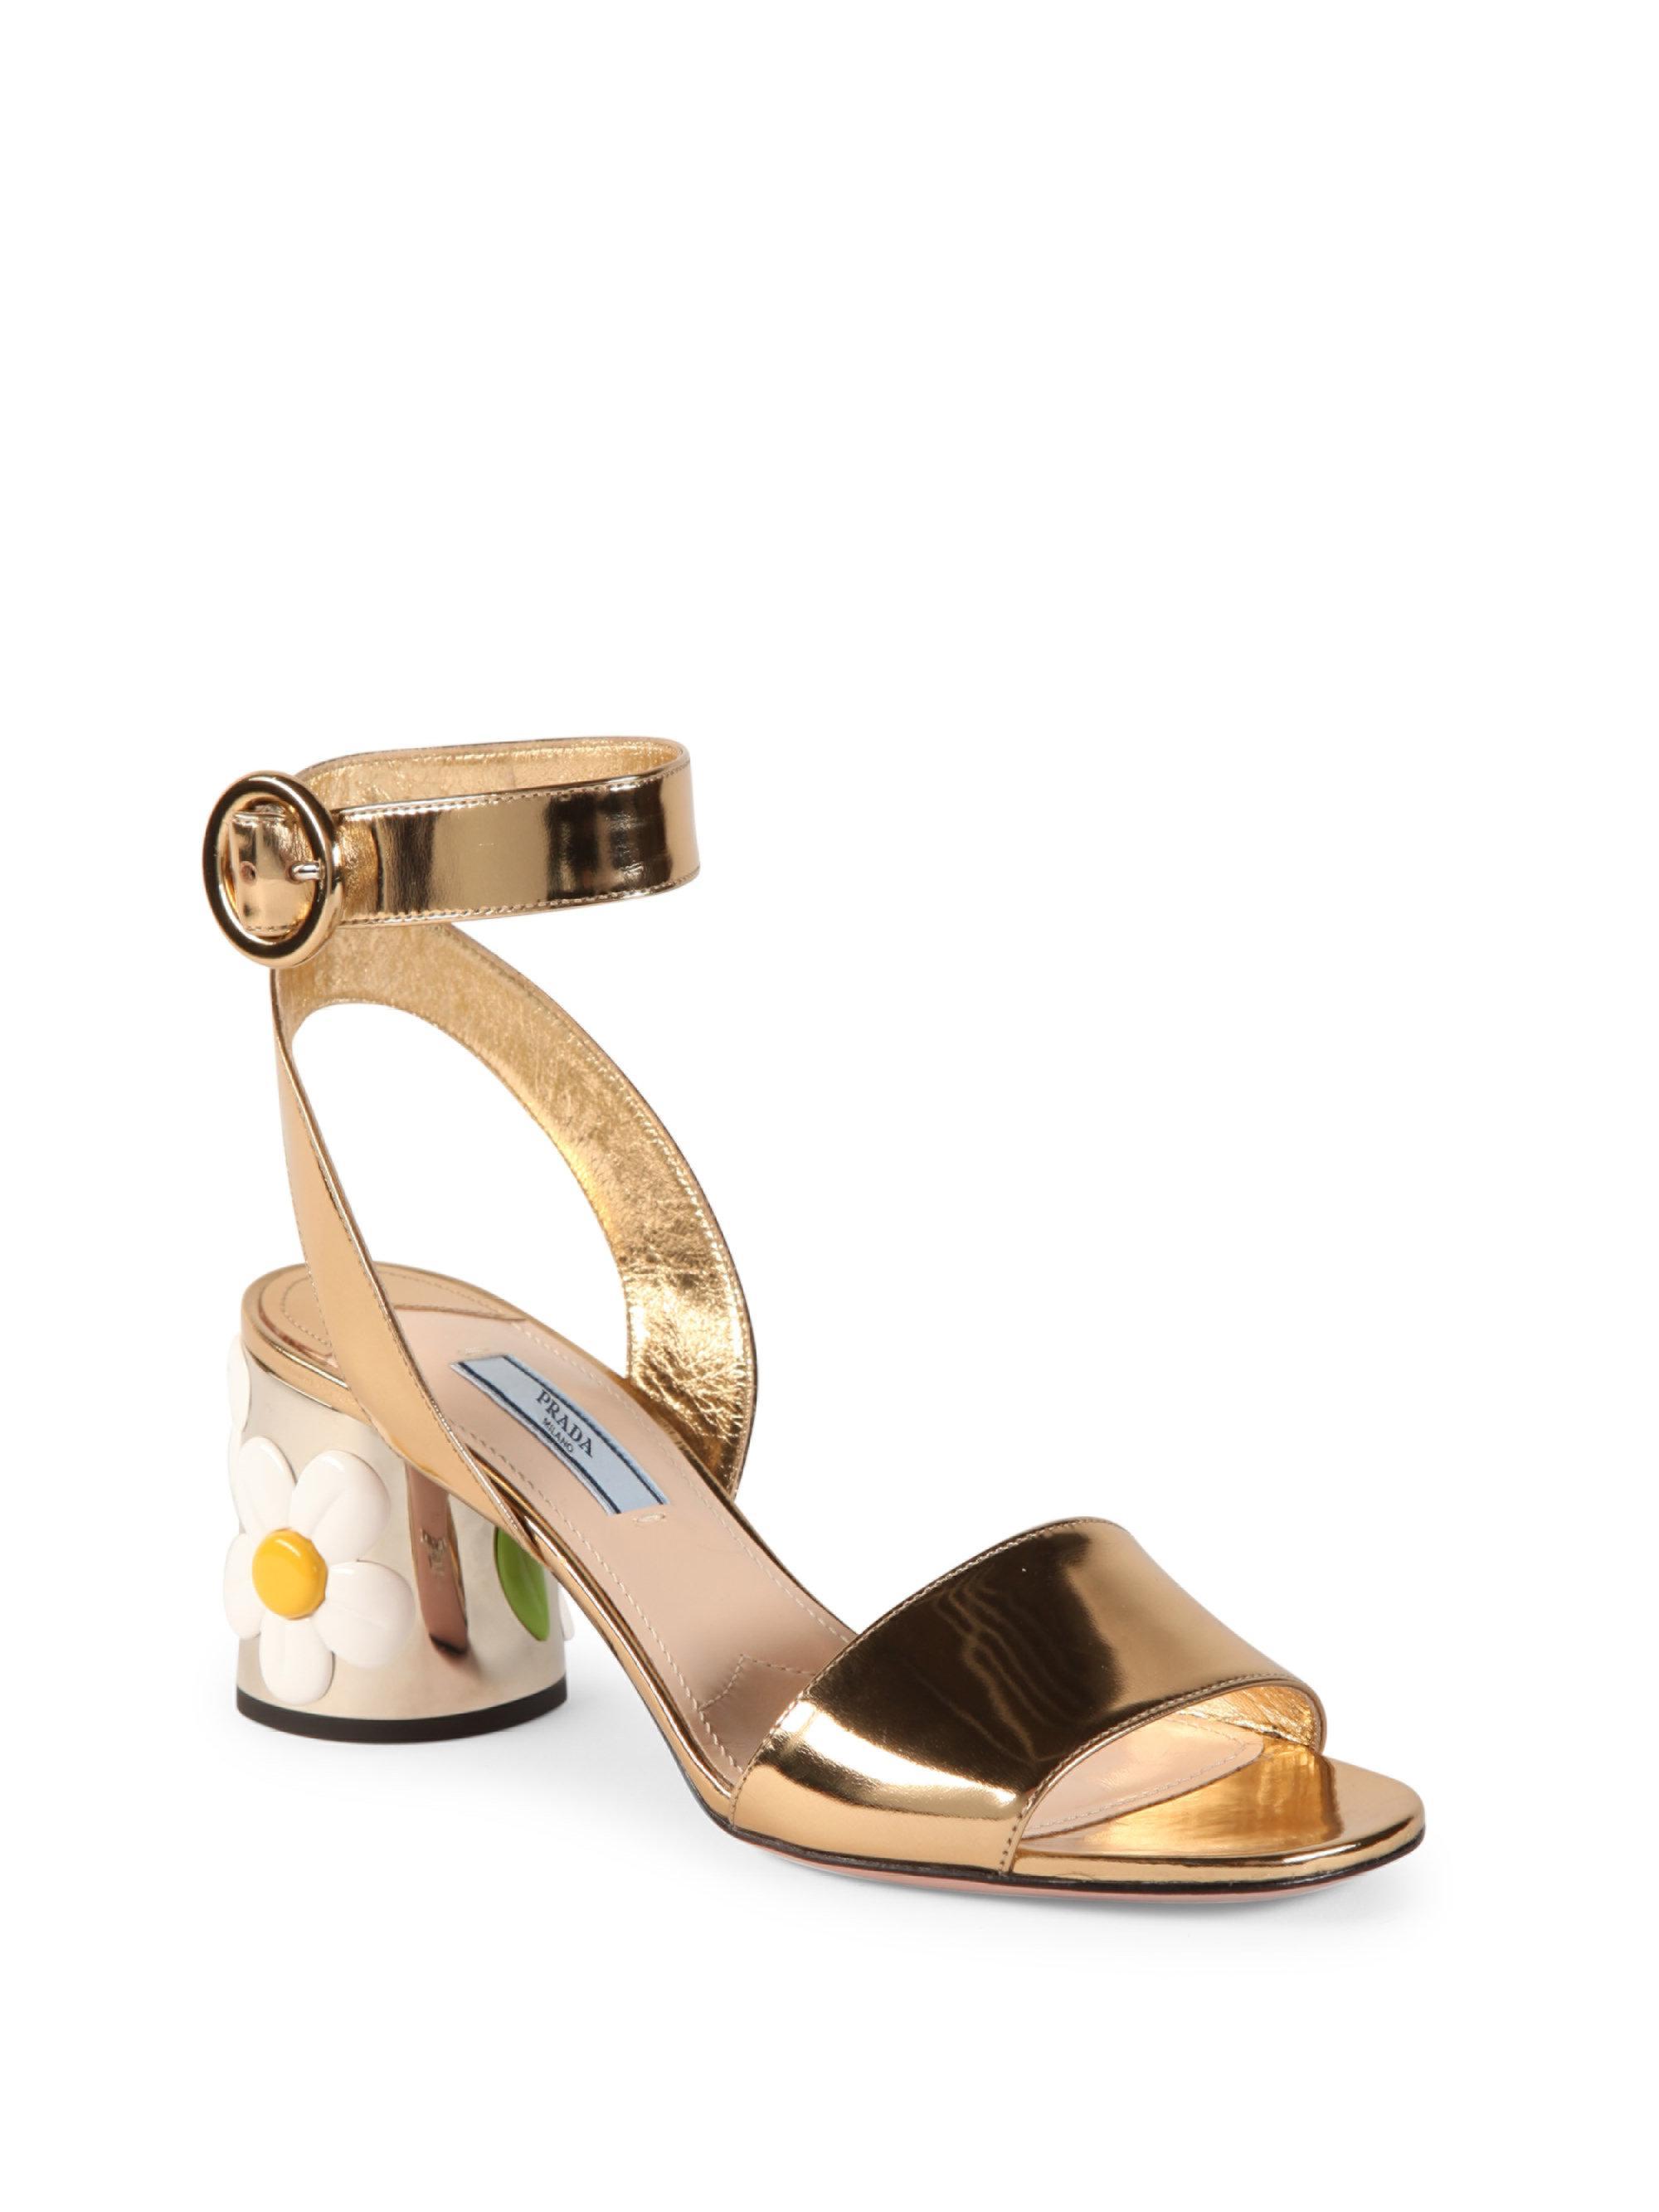 e3b8b9a0edee Lyst - Prada Flower-heel Metallic Leather Ankle-strap Sandals in ...